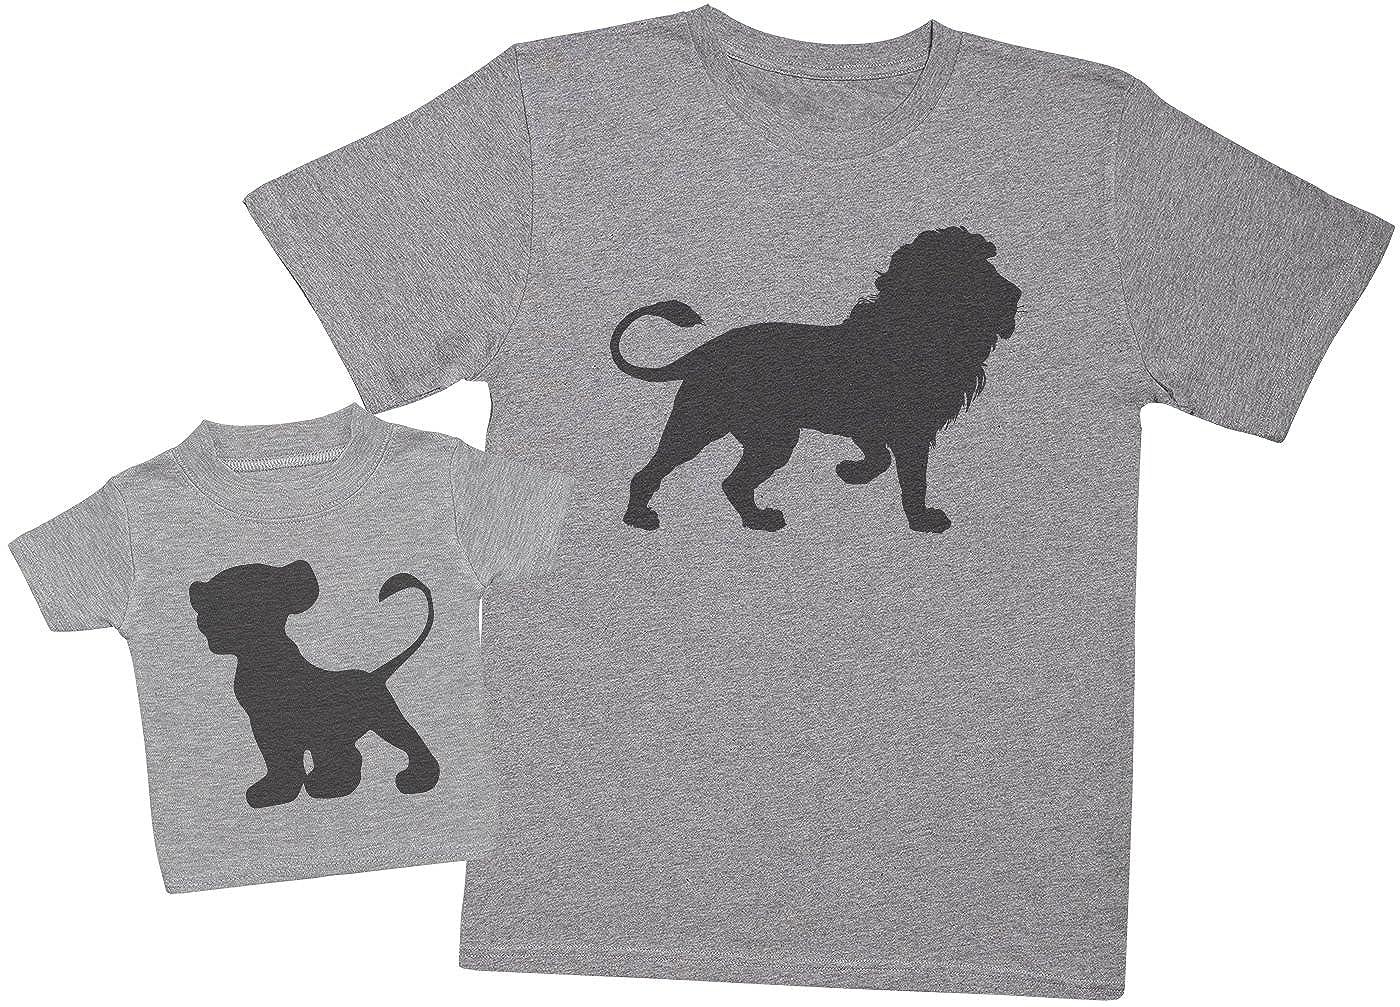 Ensemble P/ère B/éb/é Cadeau Hommes T-Shirt /& T-Shirt b/éb/é Zarlivia Clothing Lion and Cub